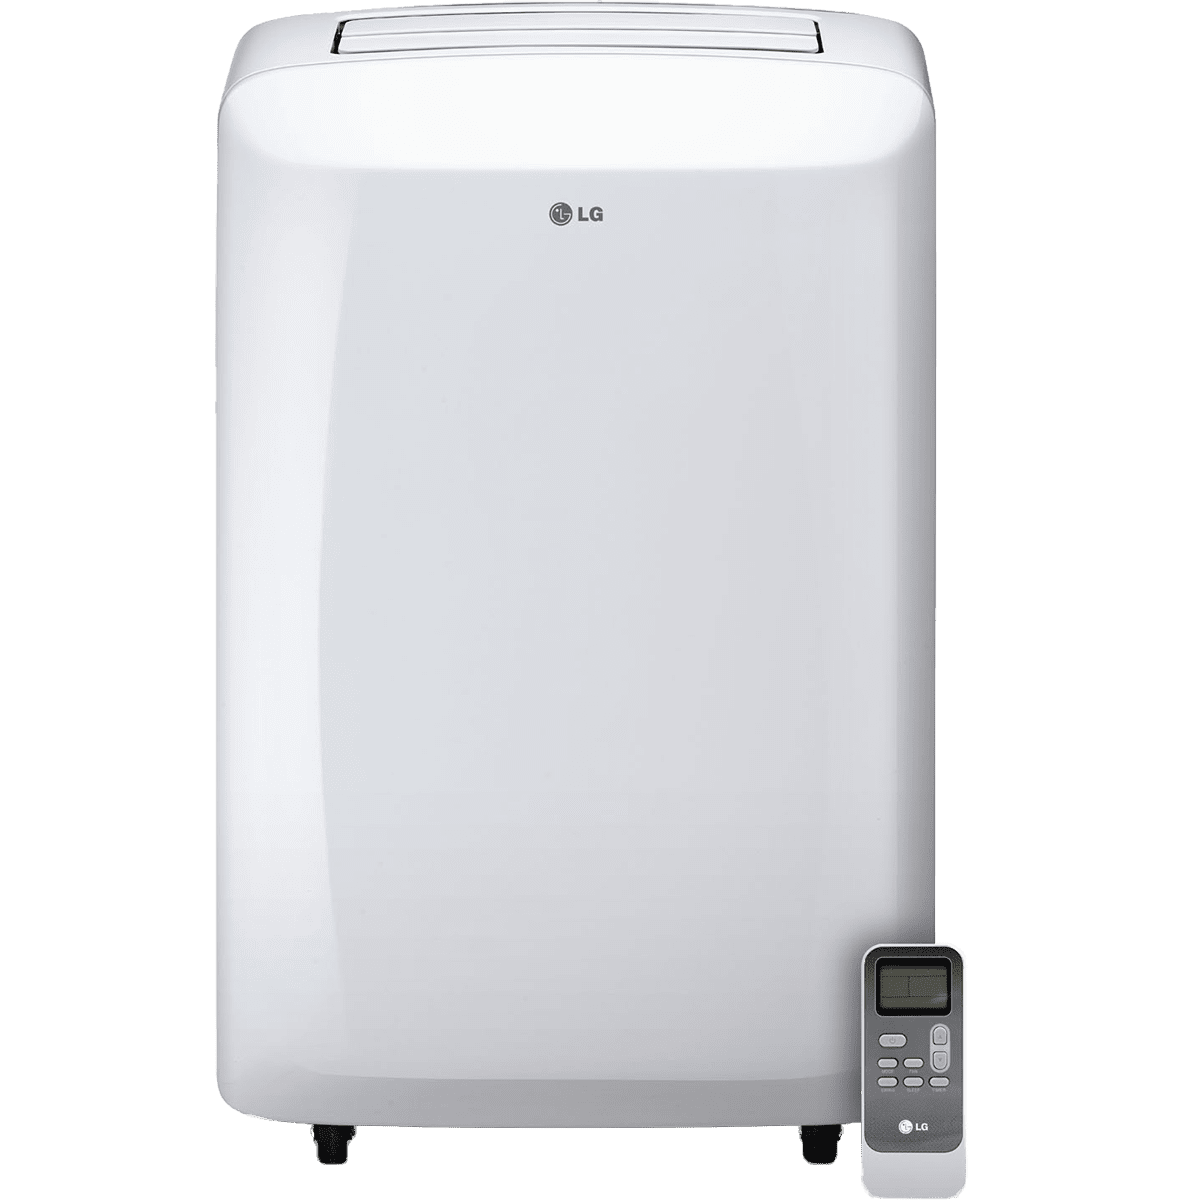 LG LP1015WSR 10,000 BTU Portable Air Conditioner lg5369